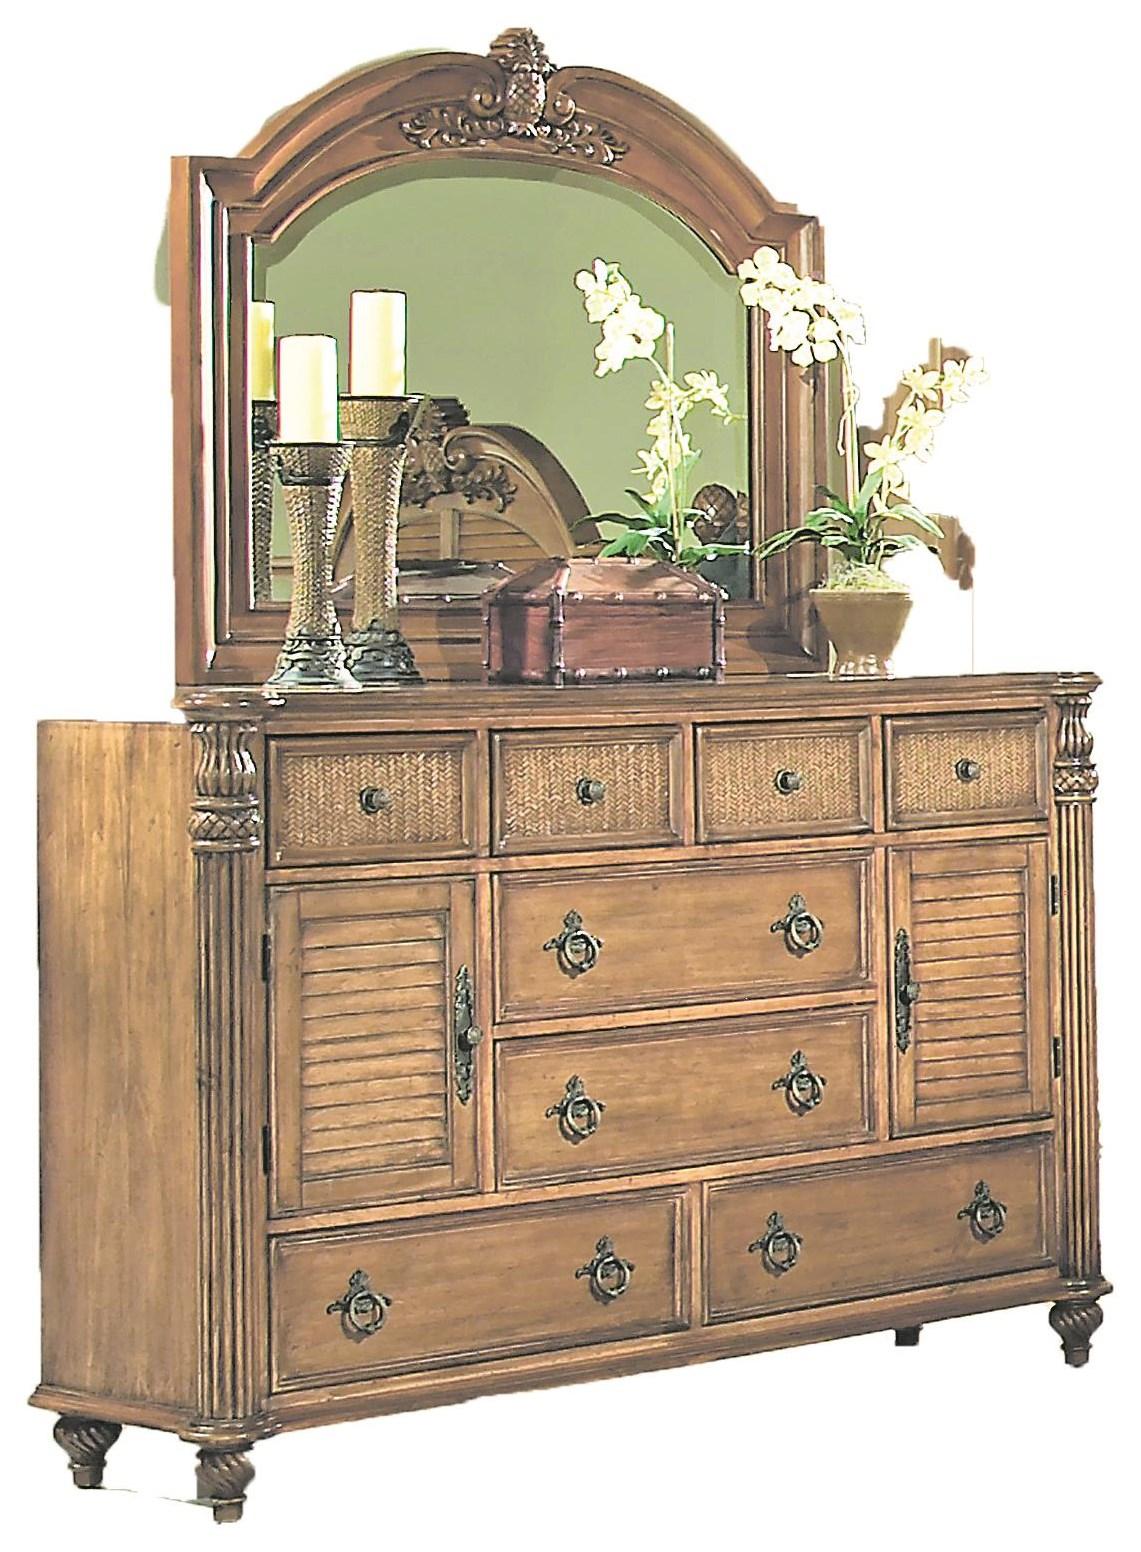 Key West Tropical Dresser by Endura Furniture at Baer's Furniture